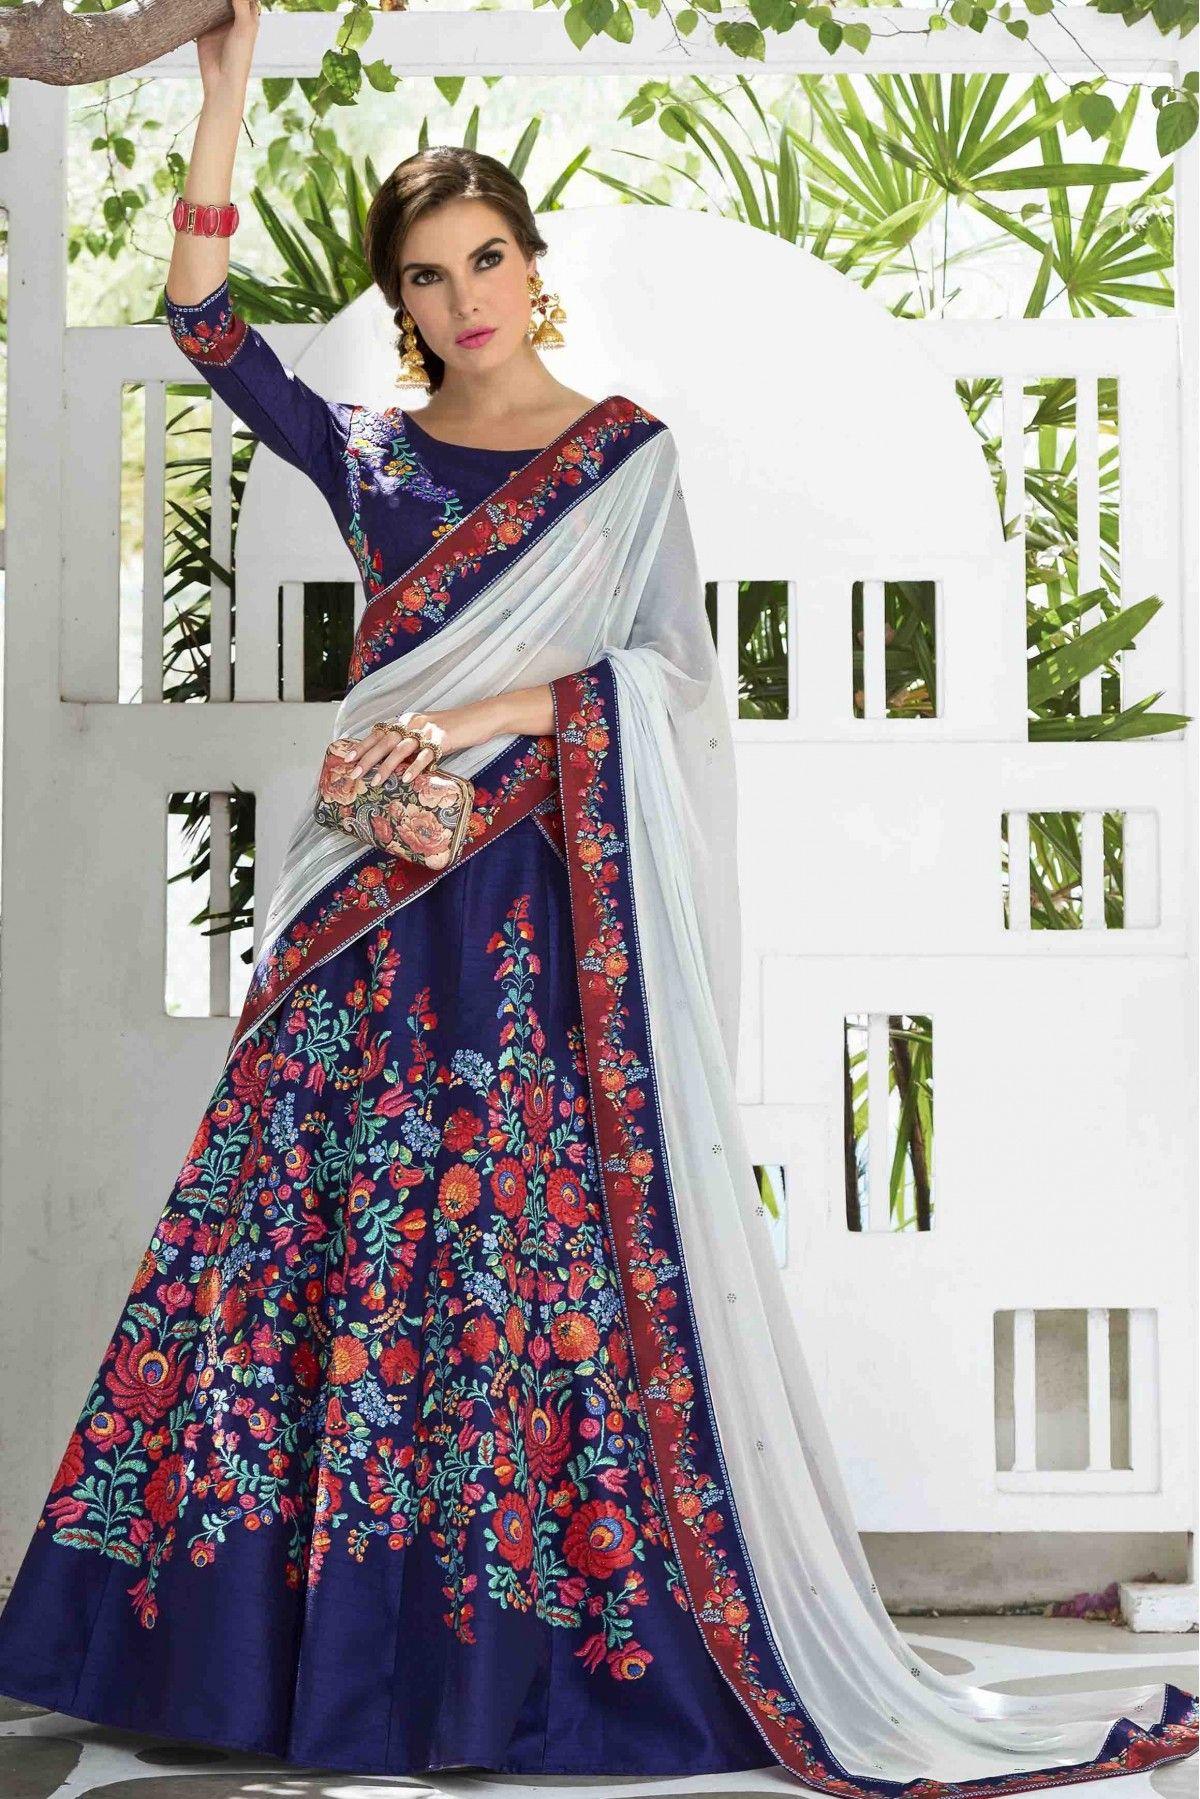 Pink dress and jacket for wedding  Simple Choli Wedding Cotton Bridal BlouseDesigns DIY Saree